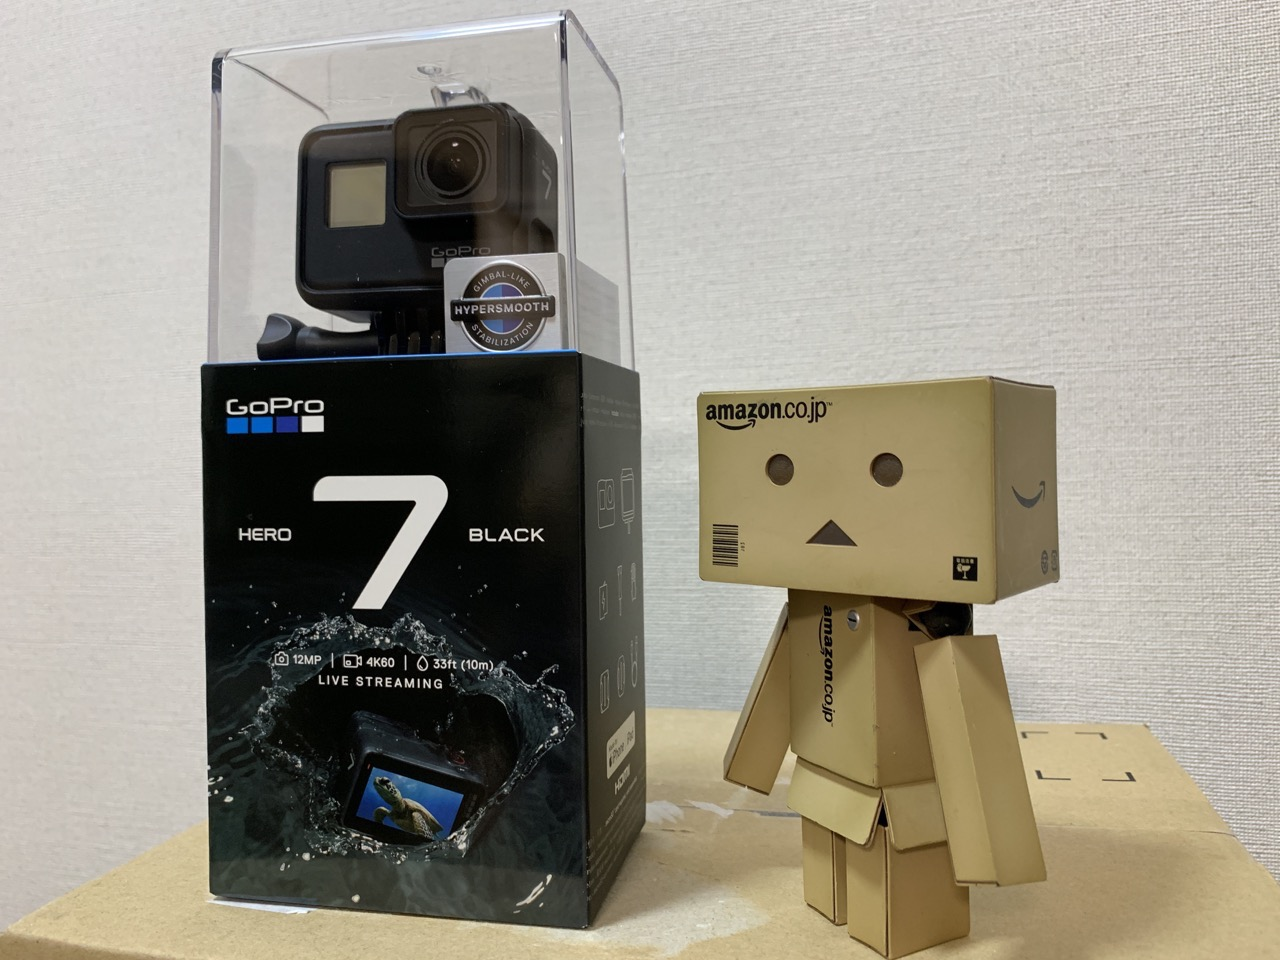 GoPro HERO7 BLACKを買ってきた!動画もすごいがタイムワープがかなりいい!